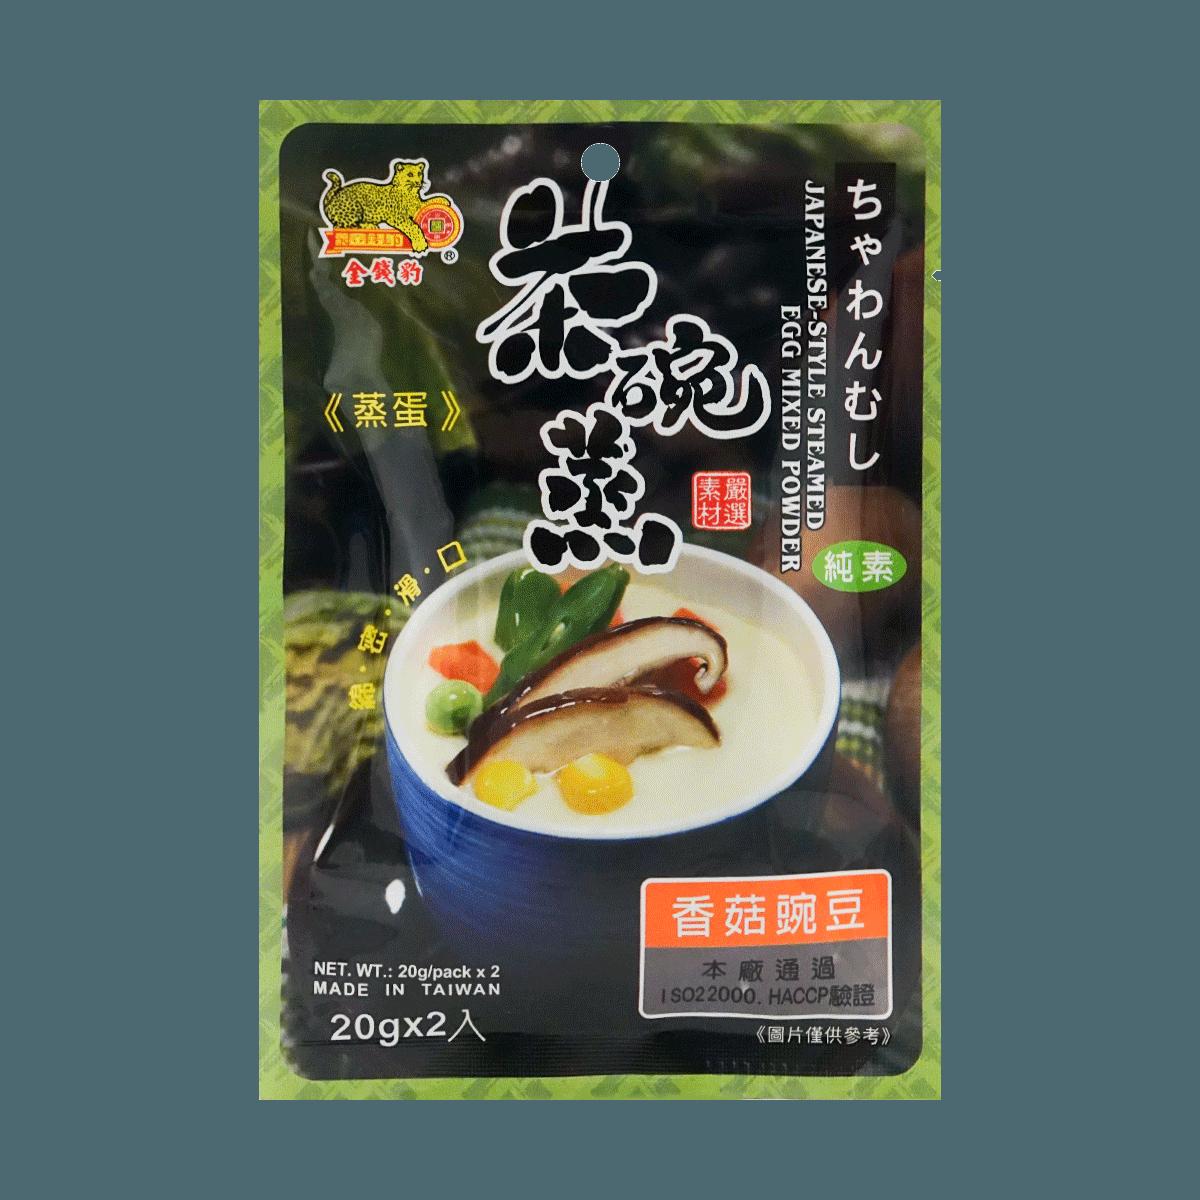 Yamibuy.com:Customer reviews:JAGUAR Japanese- Style Steamed Egg Mixed Powder (Fish Product & Corn) 20g*2